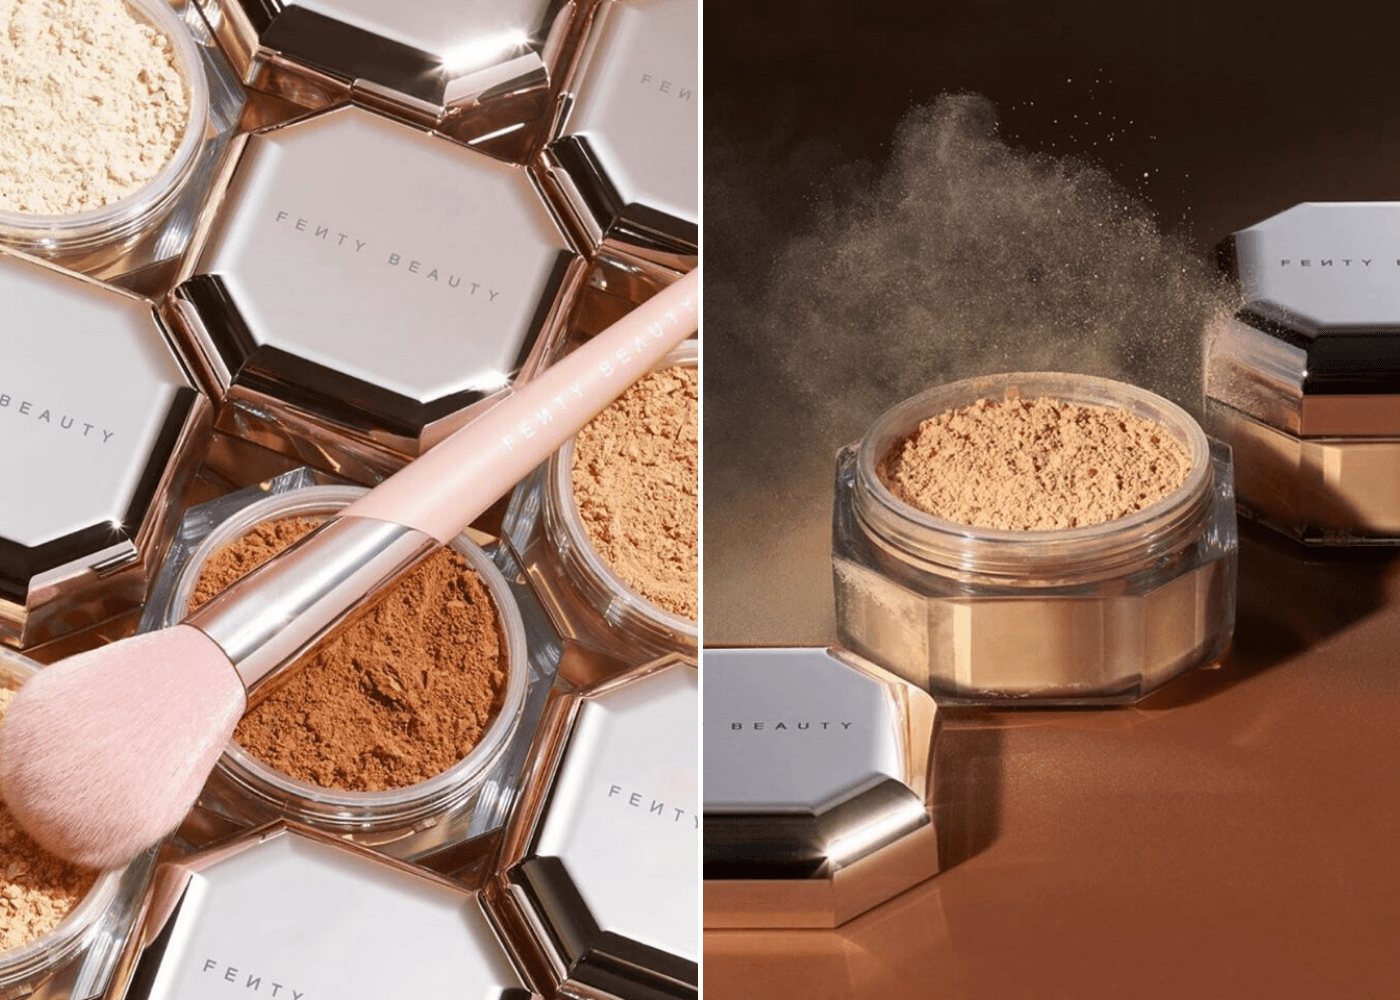 Fenty Beauty Pro Filt'r Instant Retouch Setting Powder | Face powders